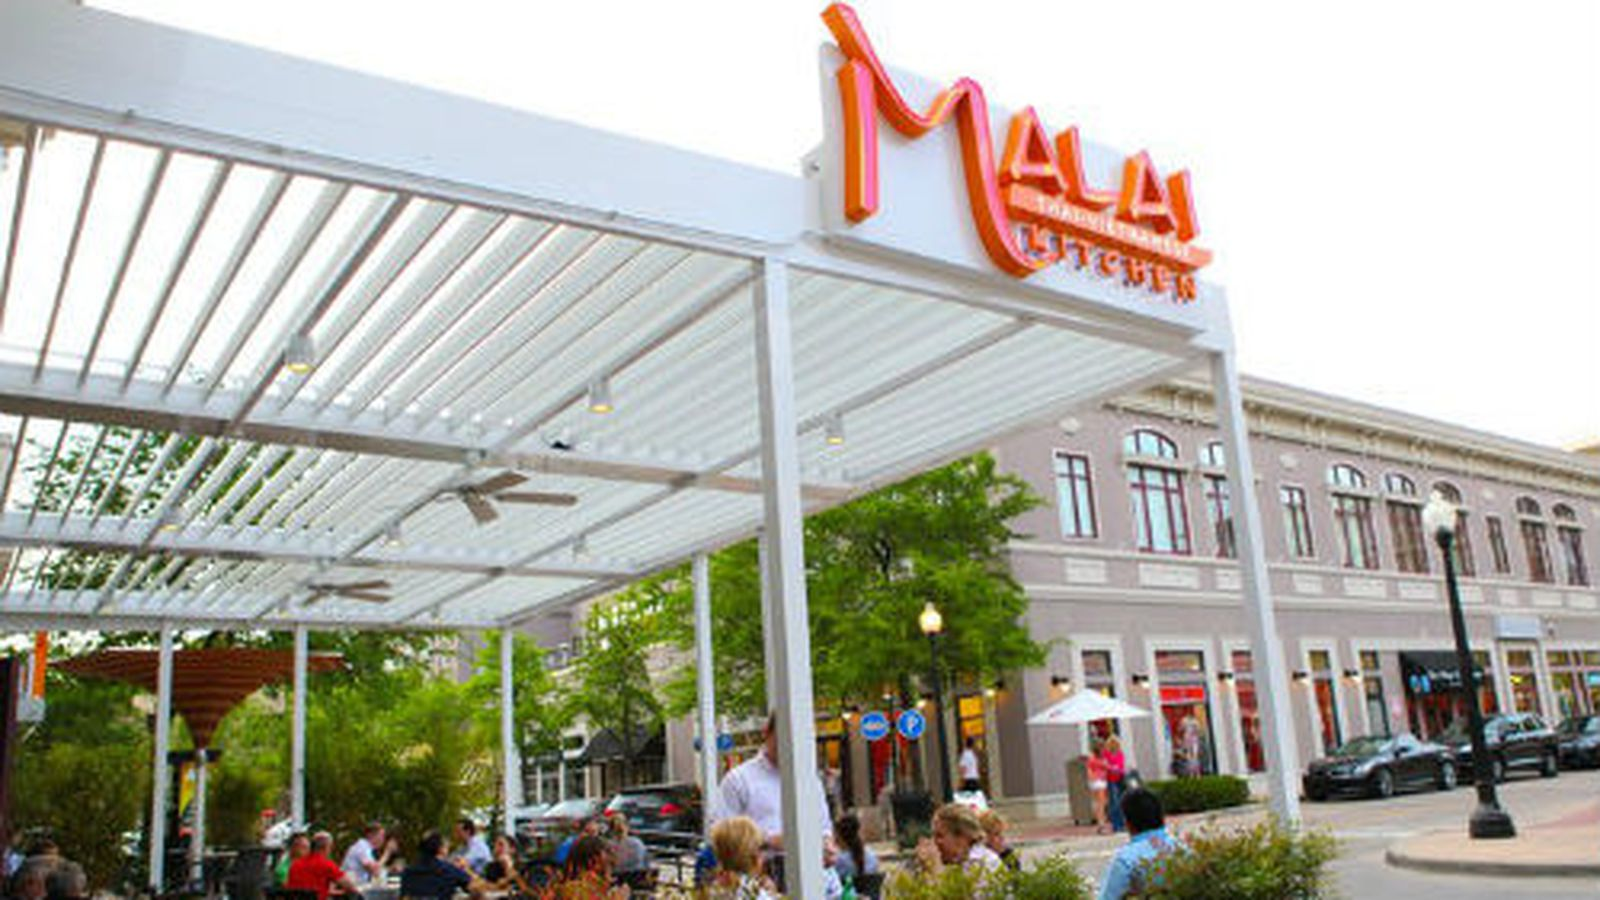 Malai Kitchen Lands In Southlake Next Week - Eater Dallas